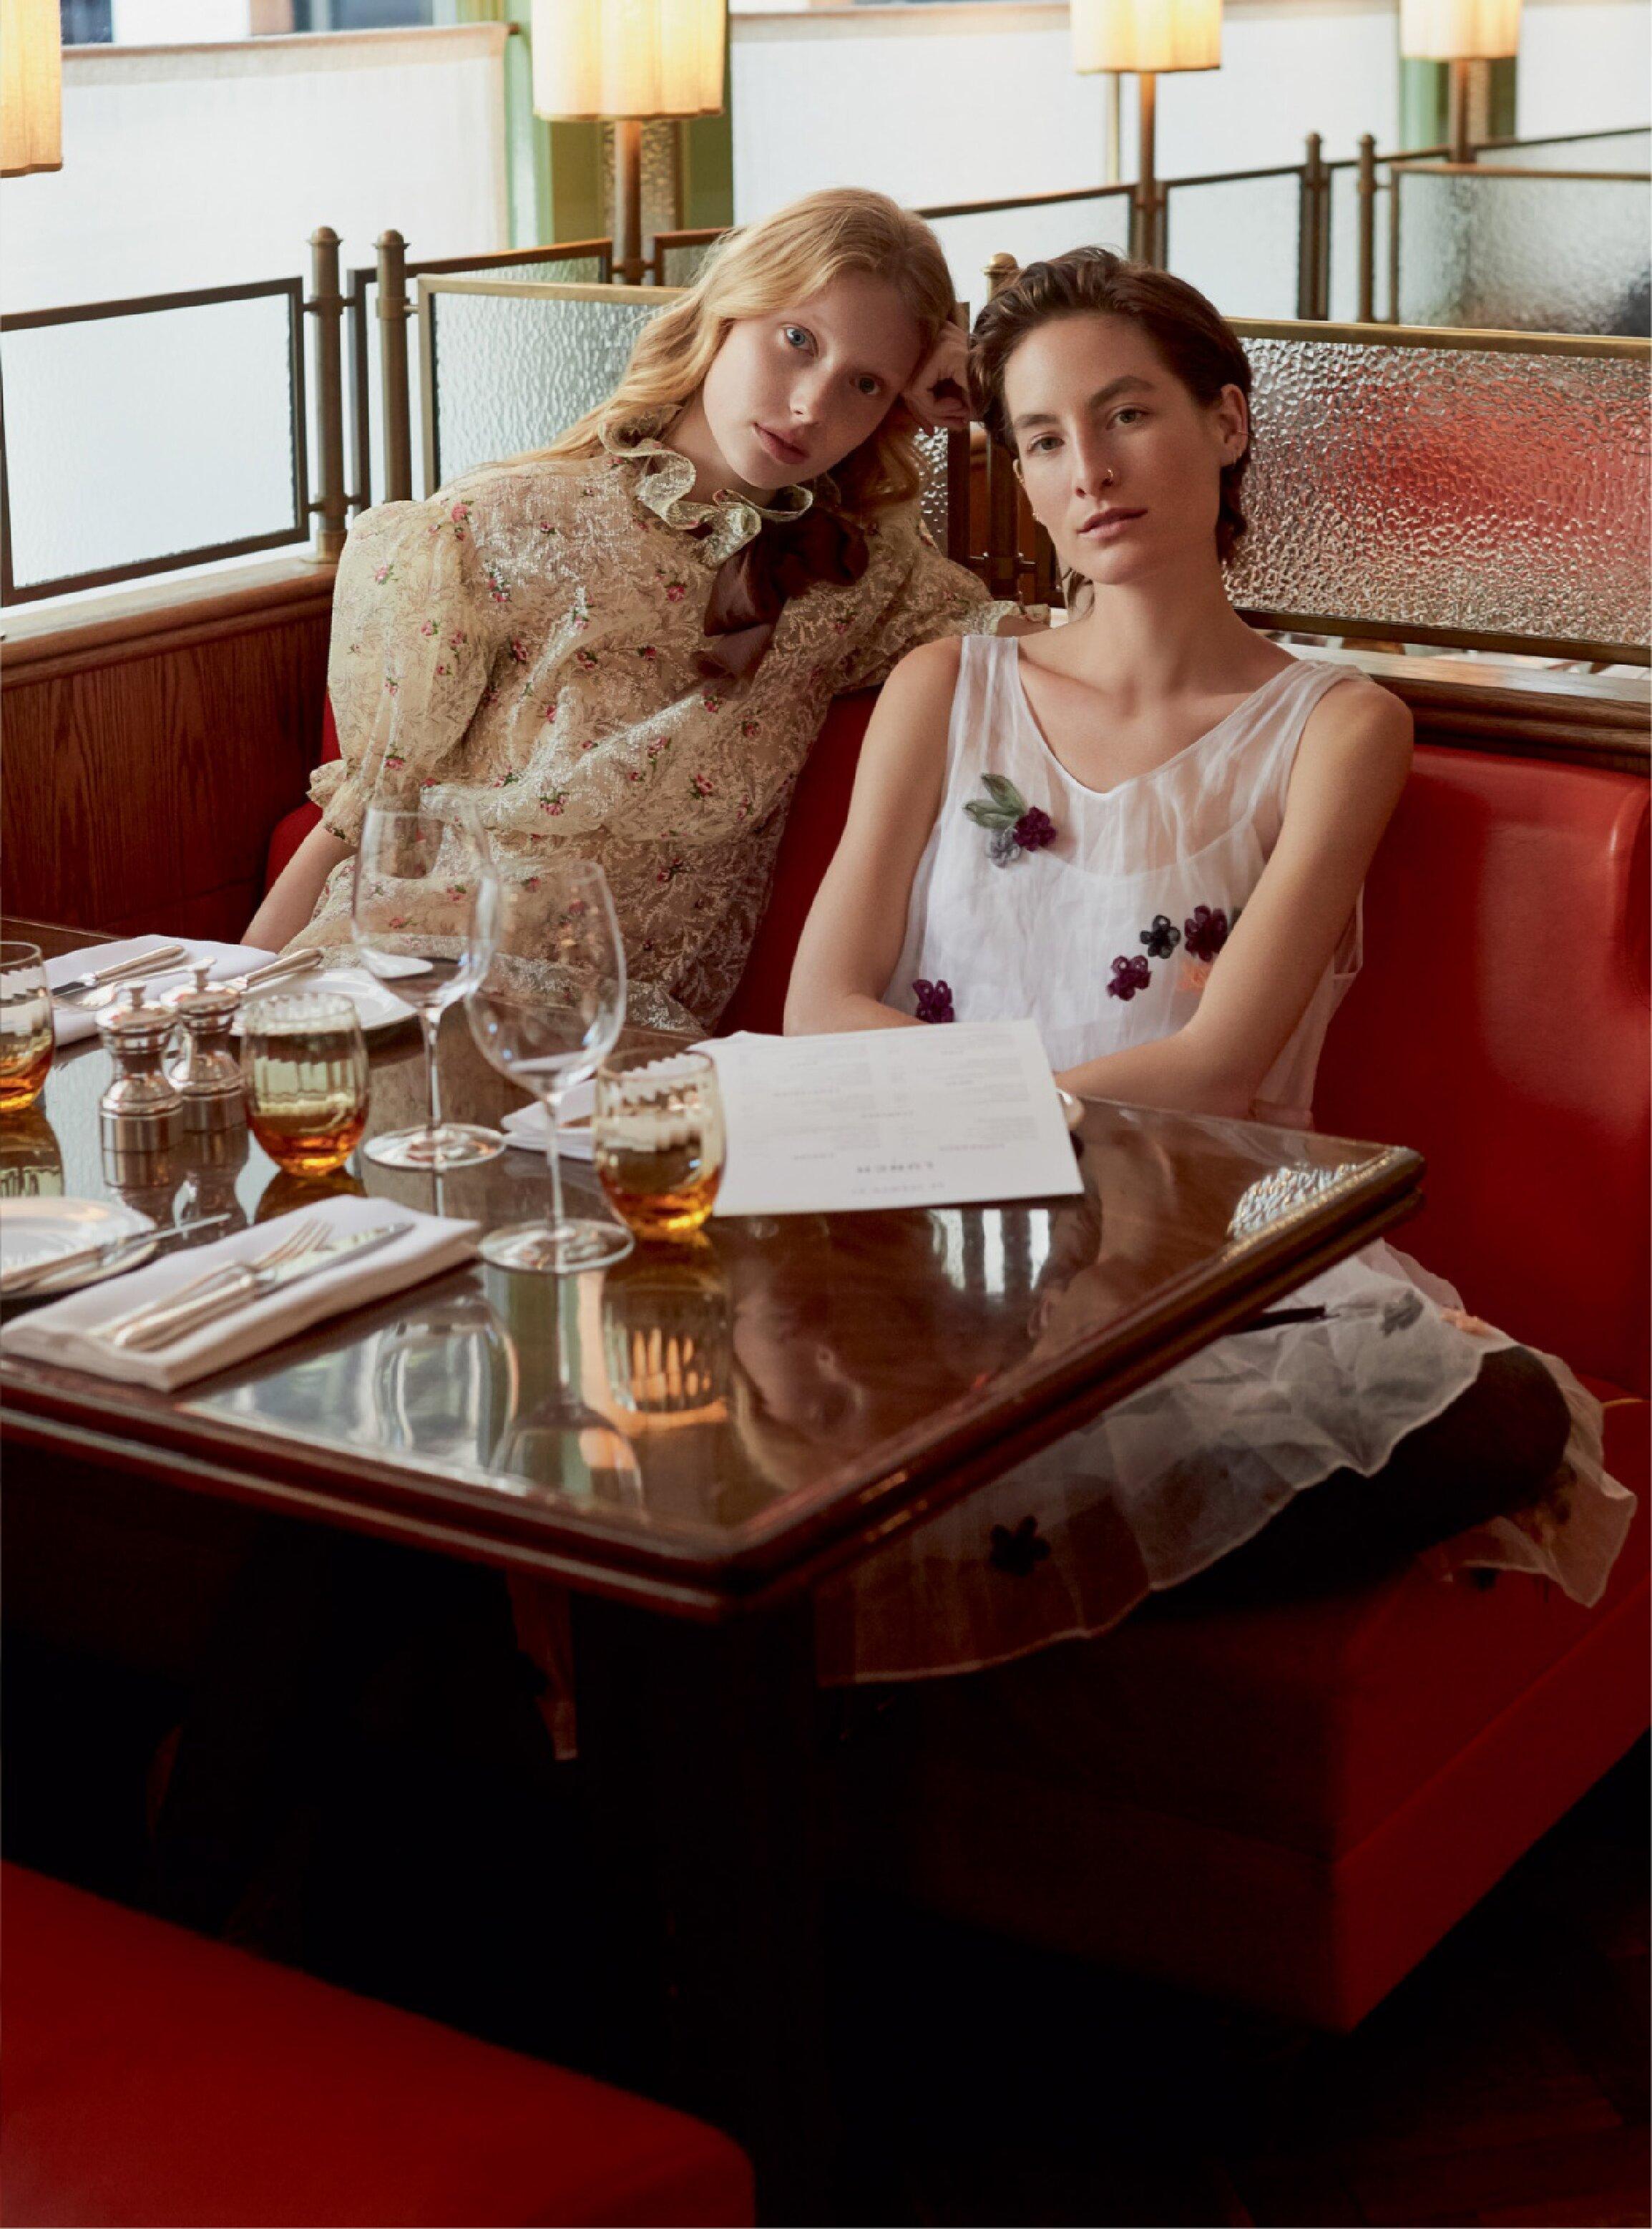 Agata Popieszynska-Girls Are Back in Town Harper's Bazaar UK Aug 2019 (31).jpg